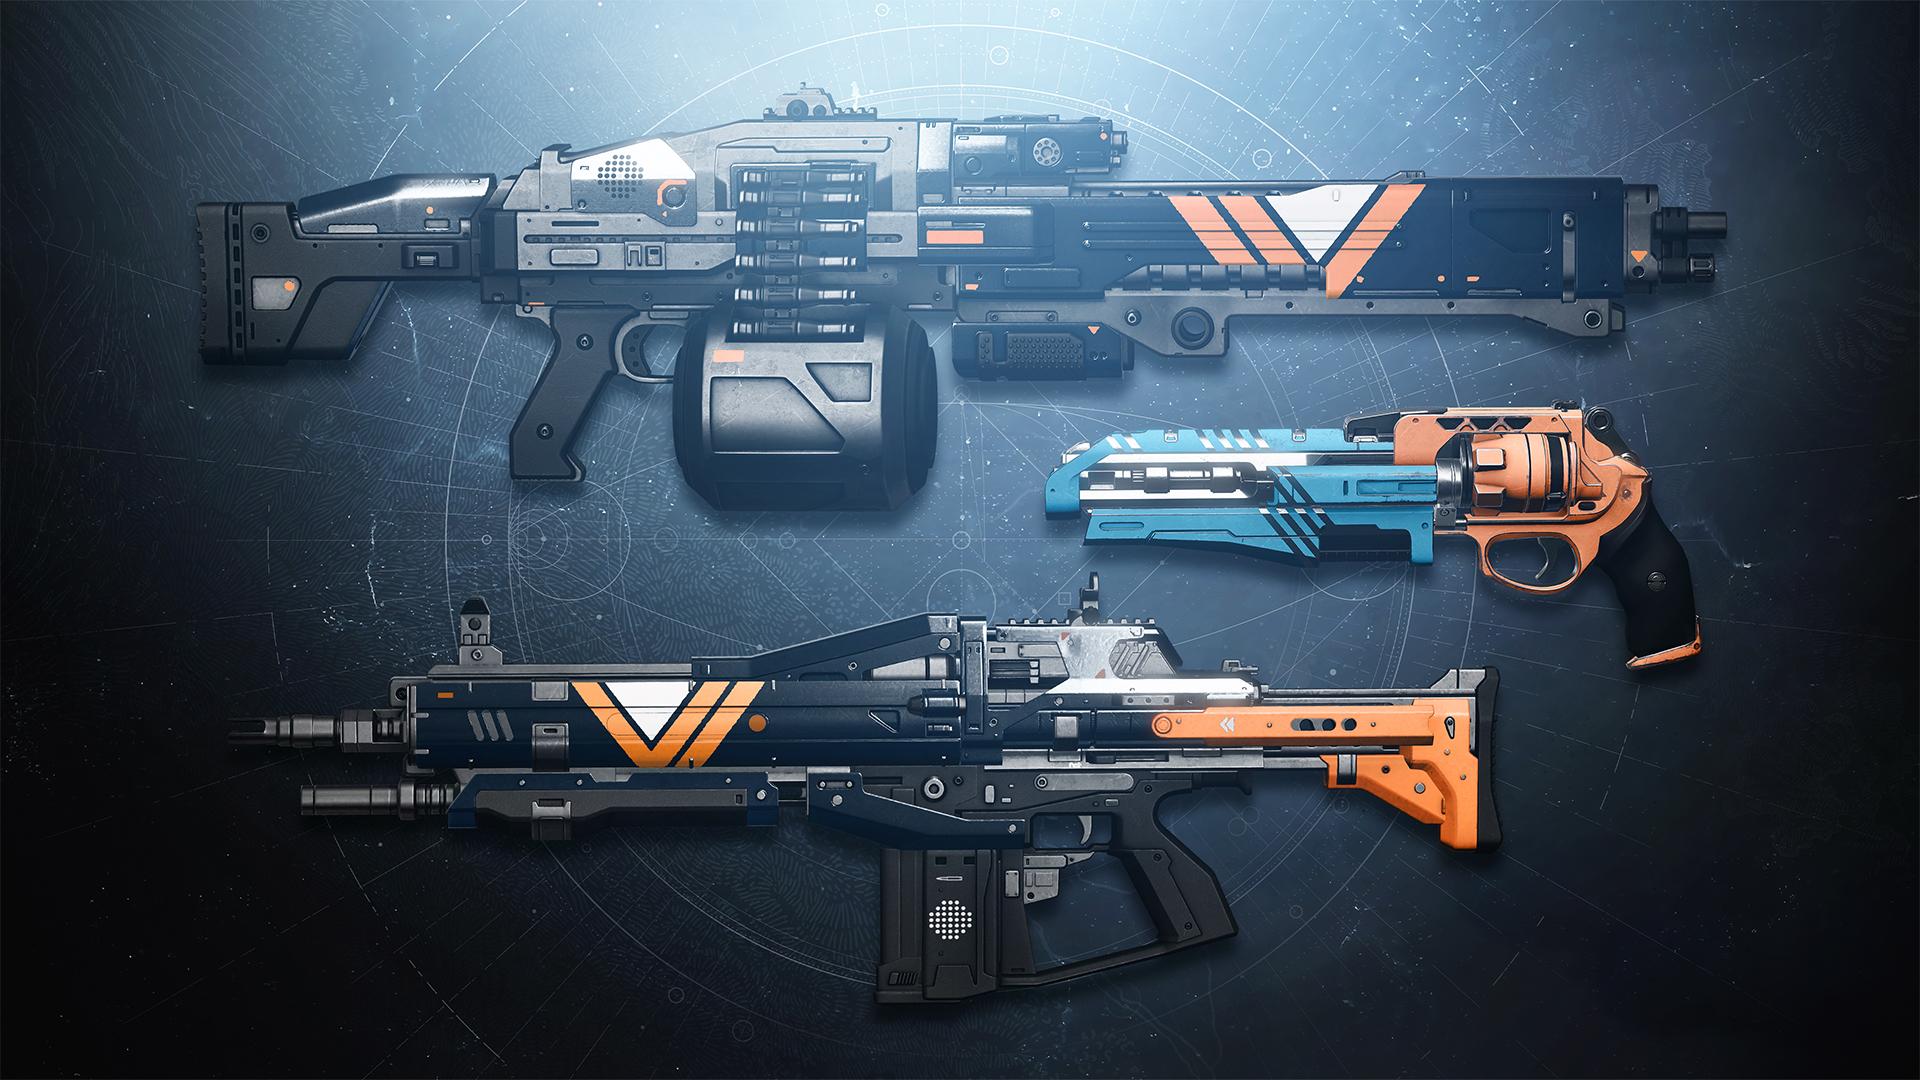 S13 Strike Weapons - This Week At Bungie 2/04/2021